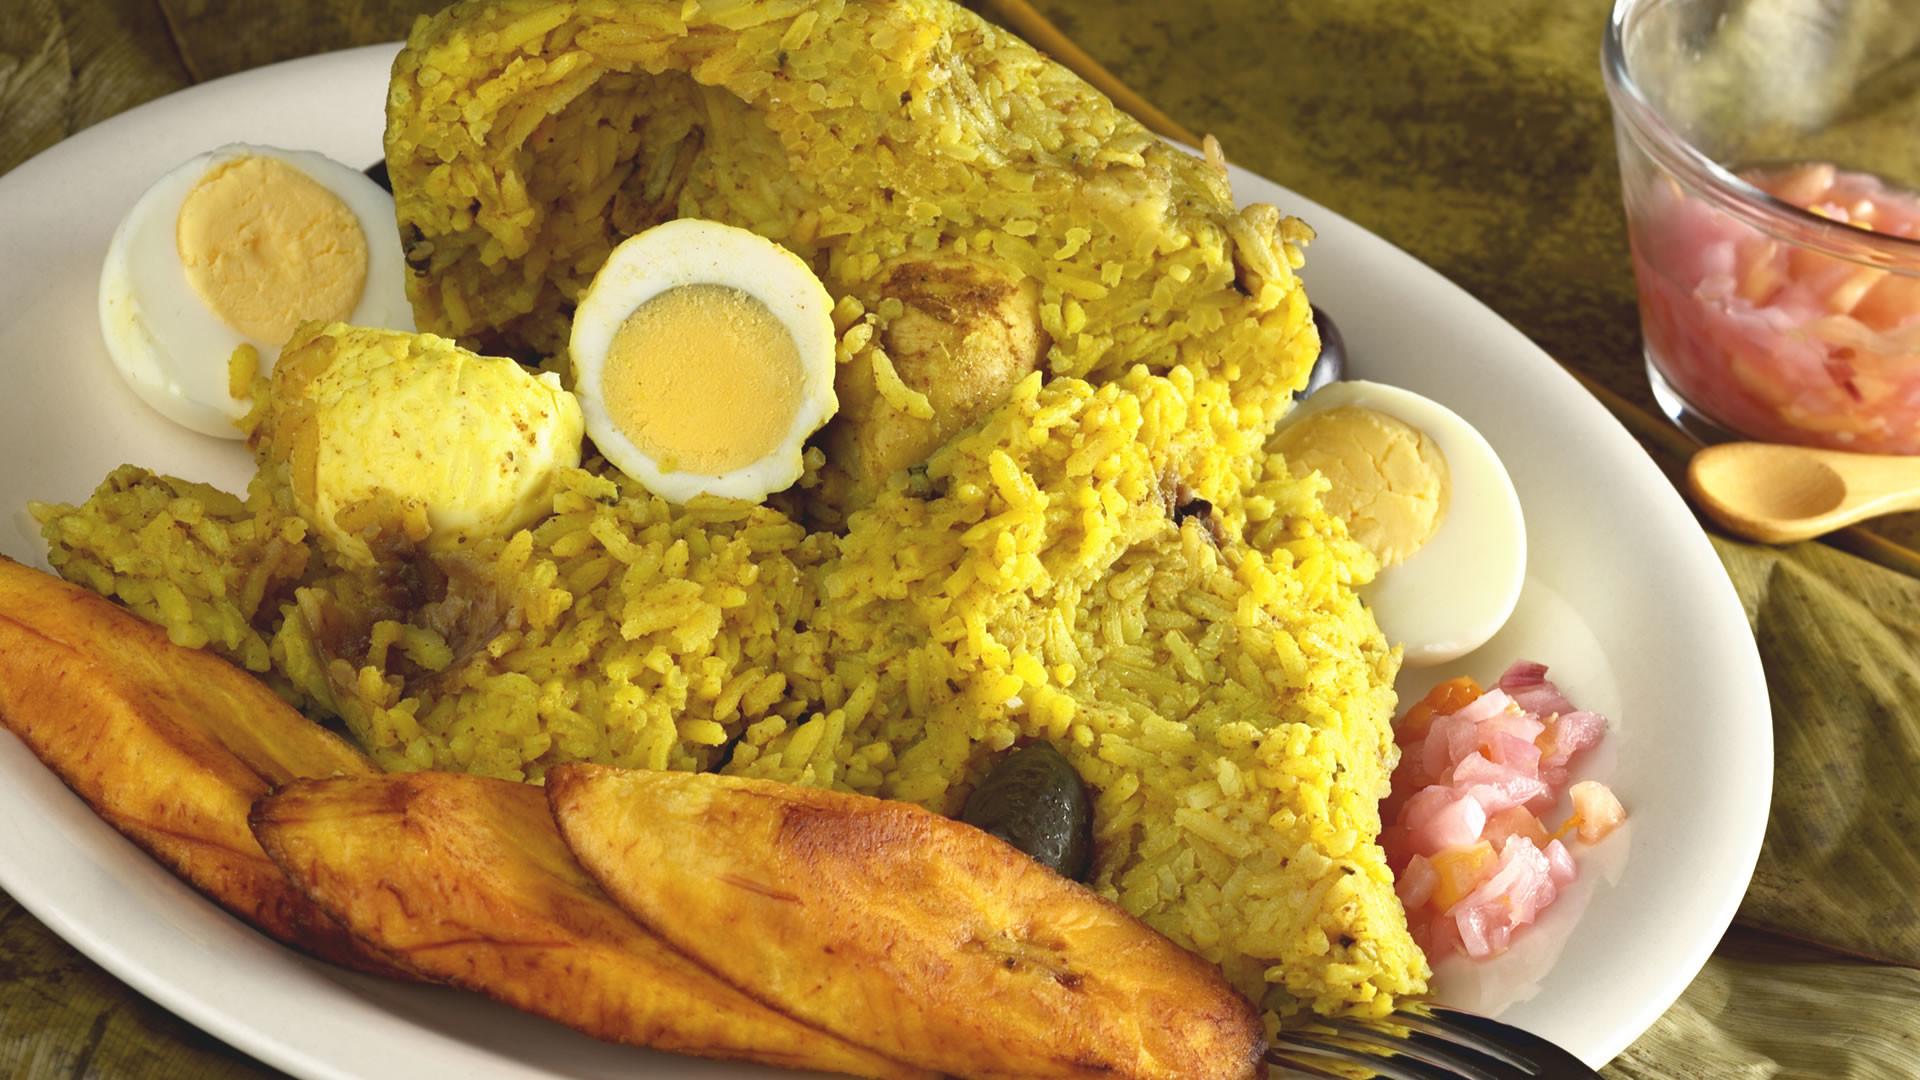 peruvian food comida peruana buy foods groceries - HD1920×1080